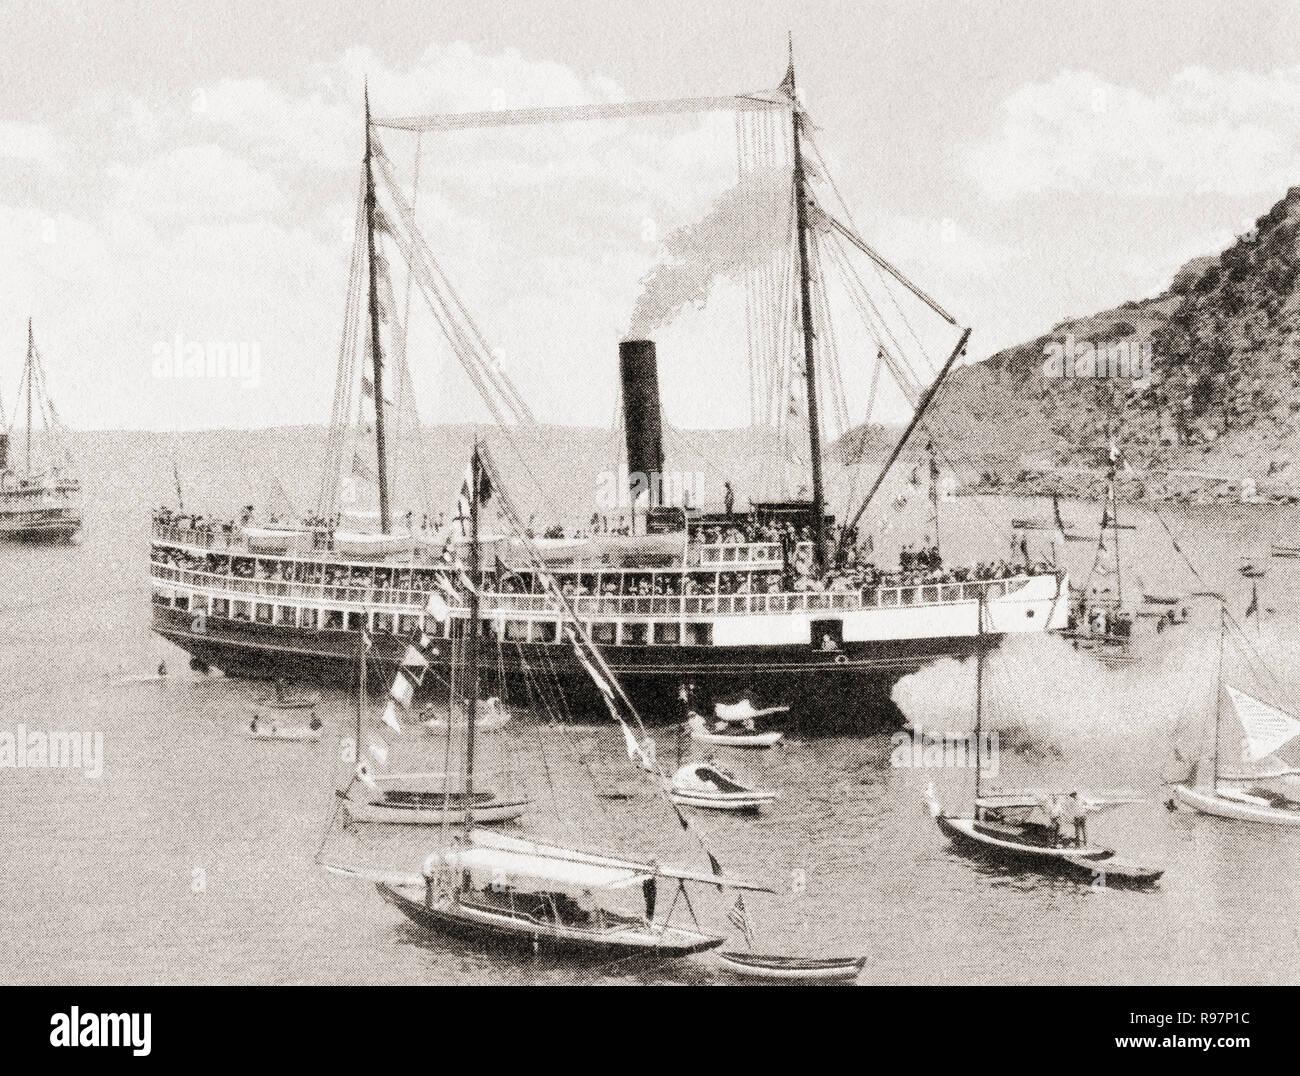 e2cca58c94fe Boats moored in Avalon Bay on Santa Catalina Island California. P77FNE  (RF). The SS Cabrillo